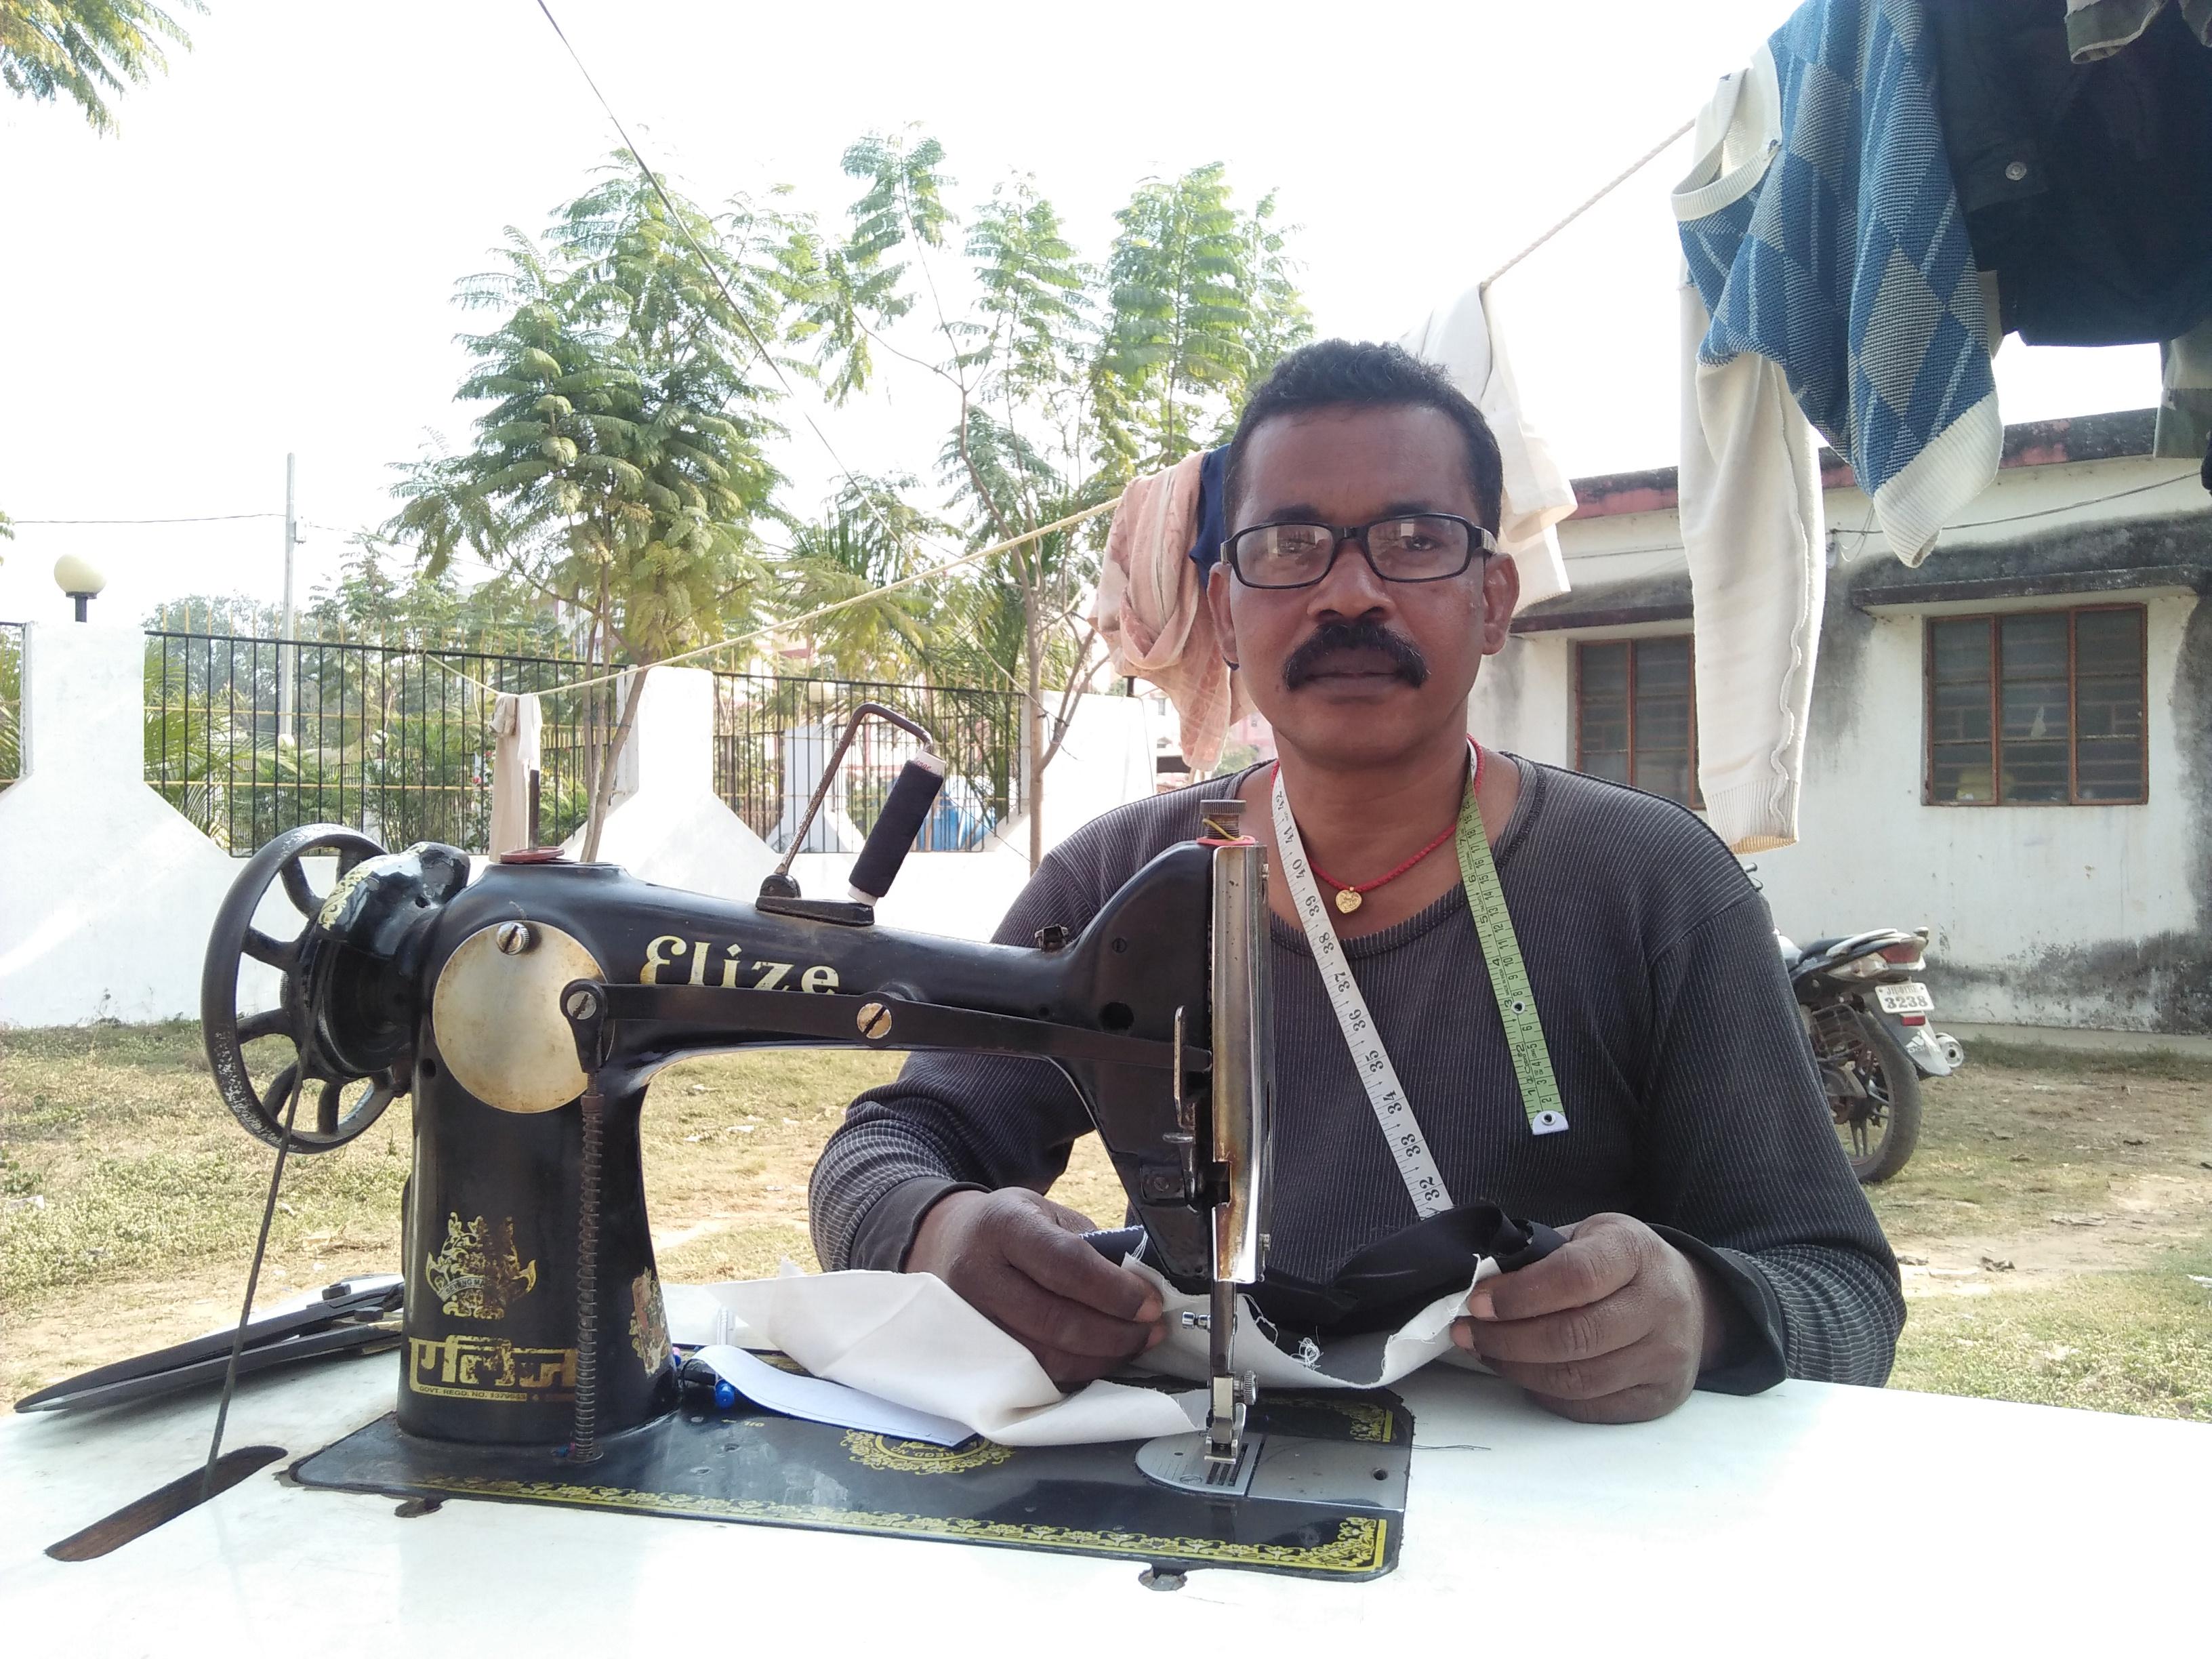 naxal, reformed naxal, jharkhand, naxalite issue